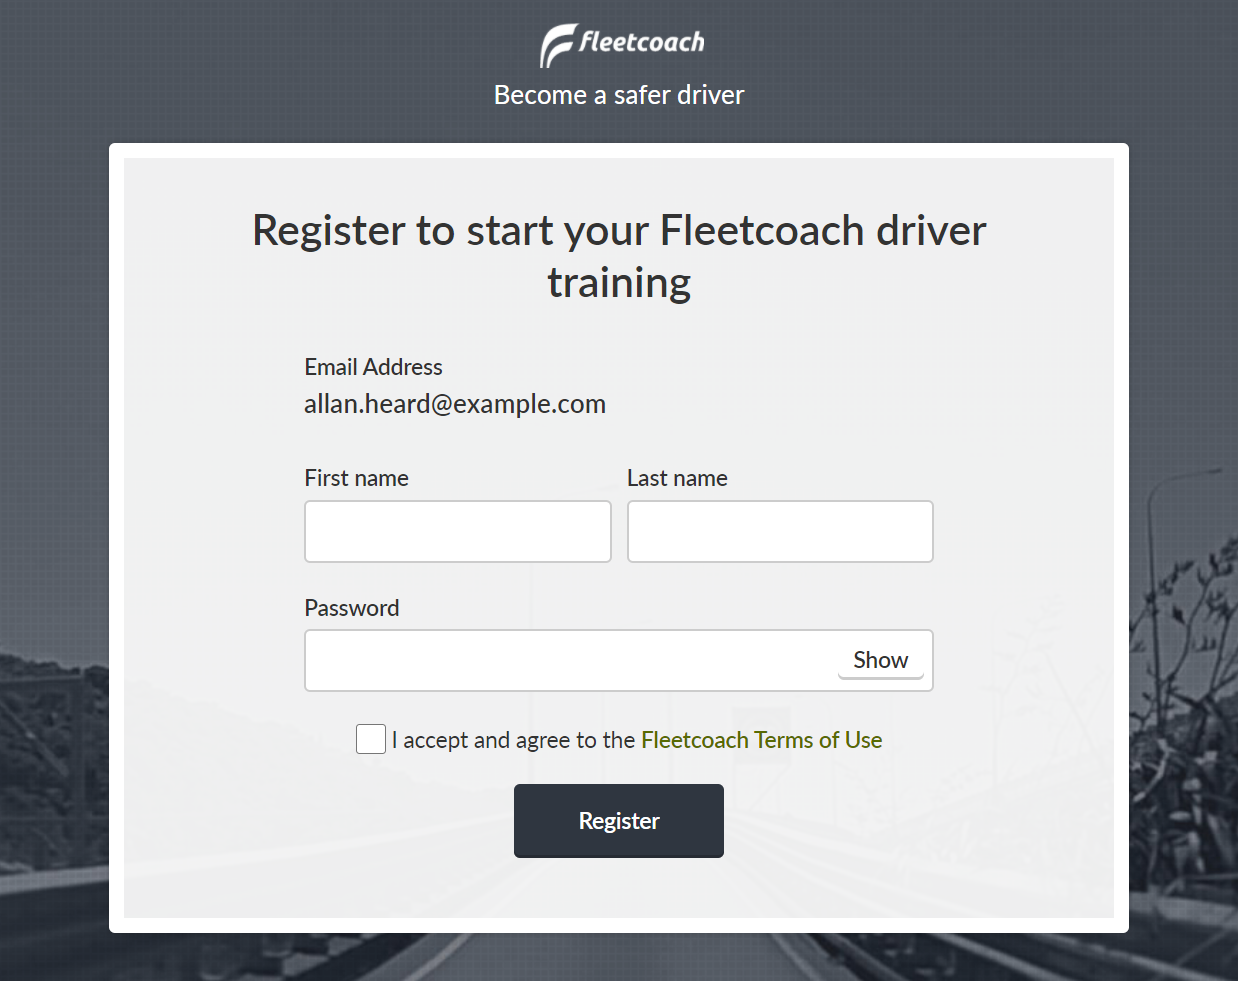 Fleetcoach registration form